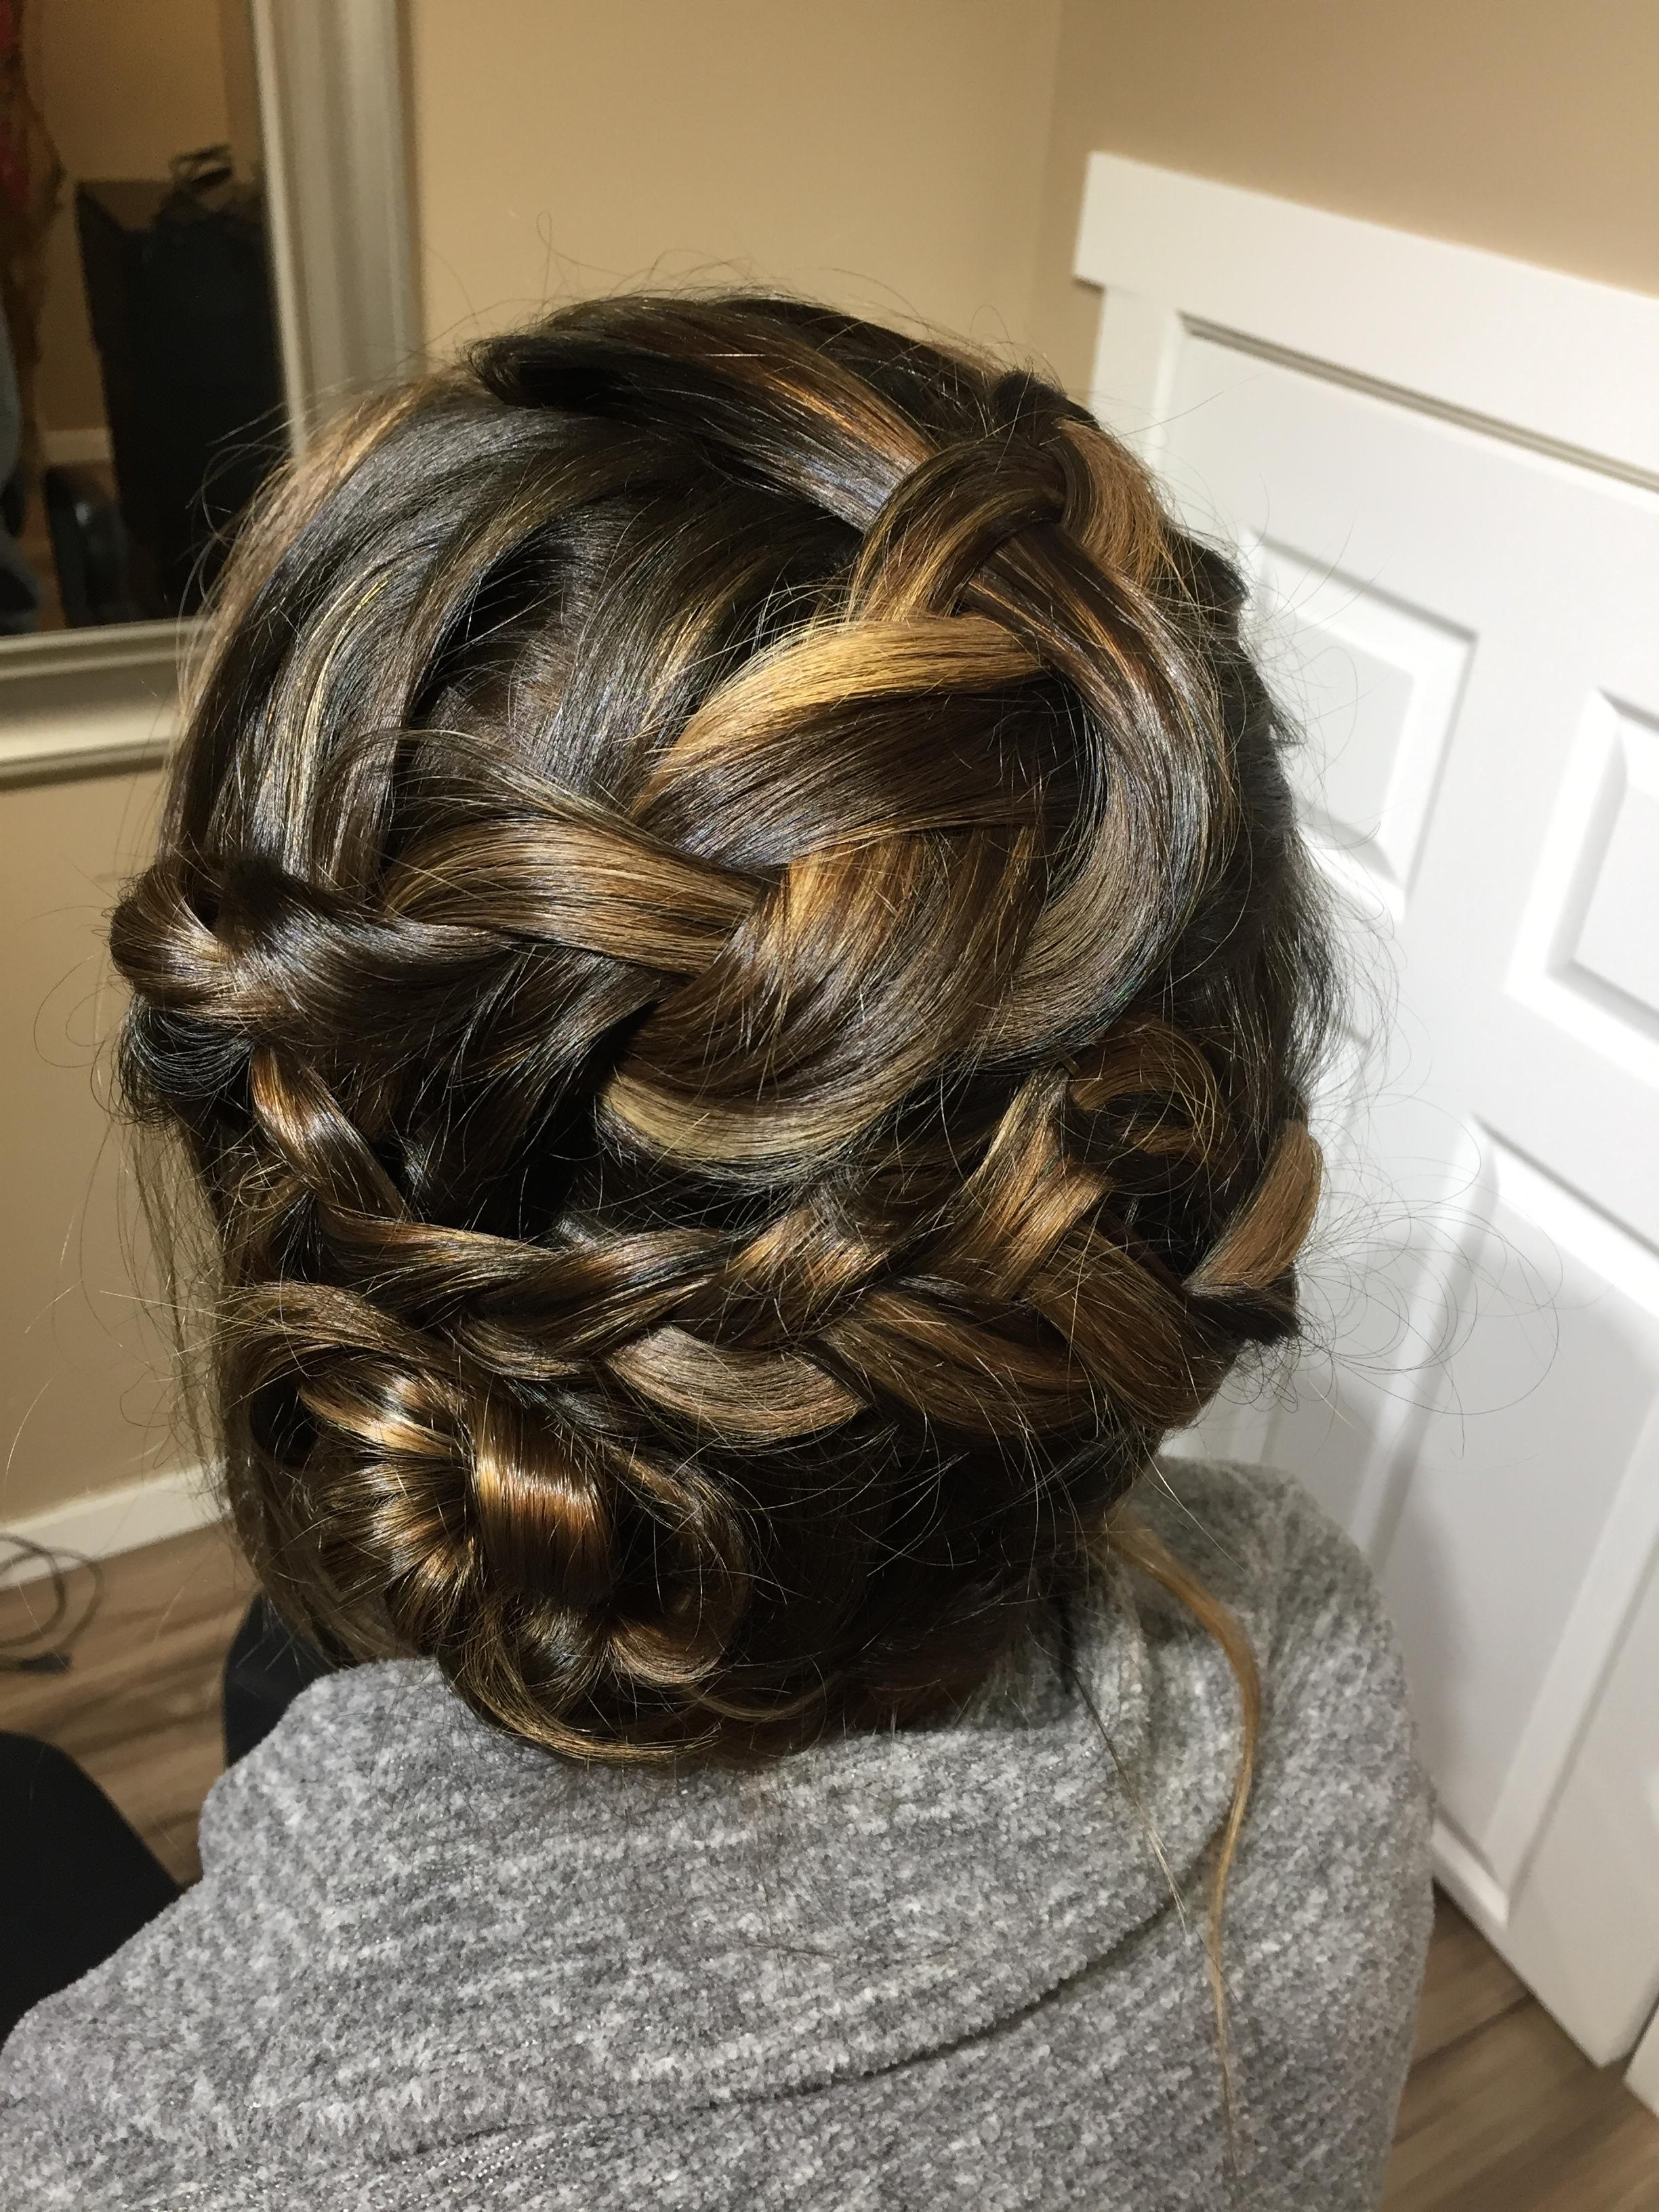 braided updo by Kara